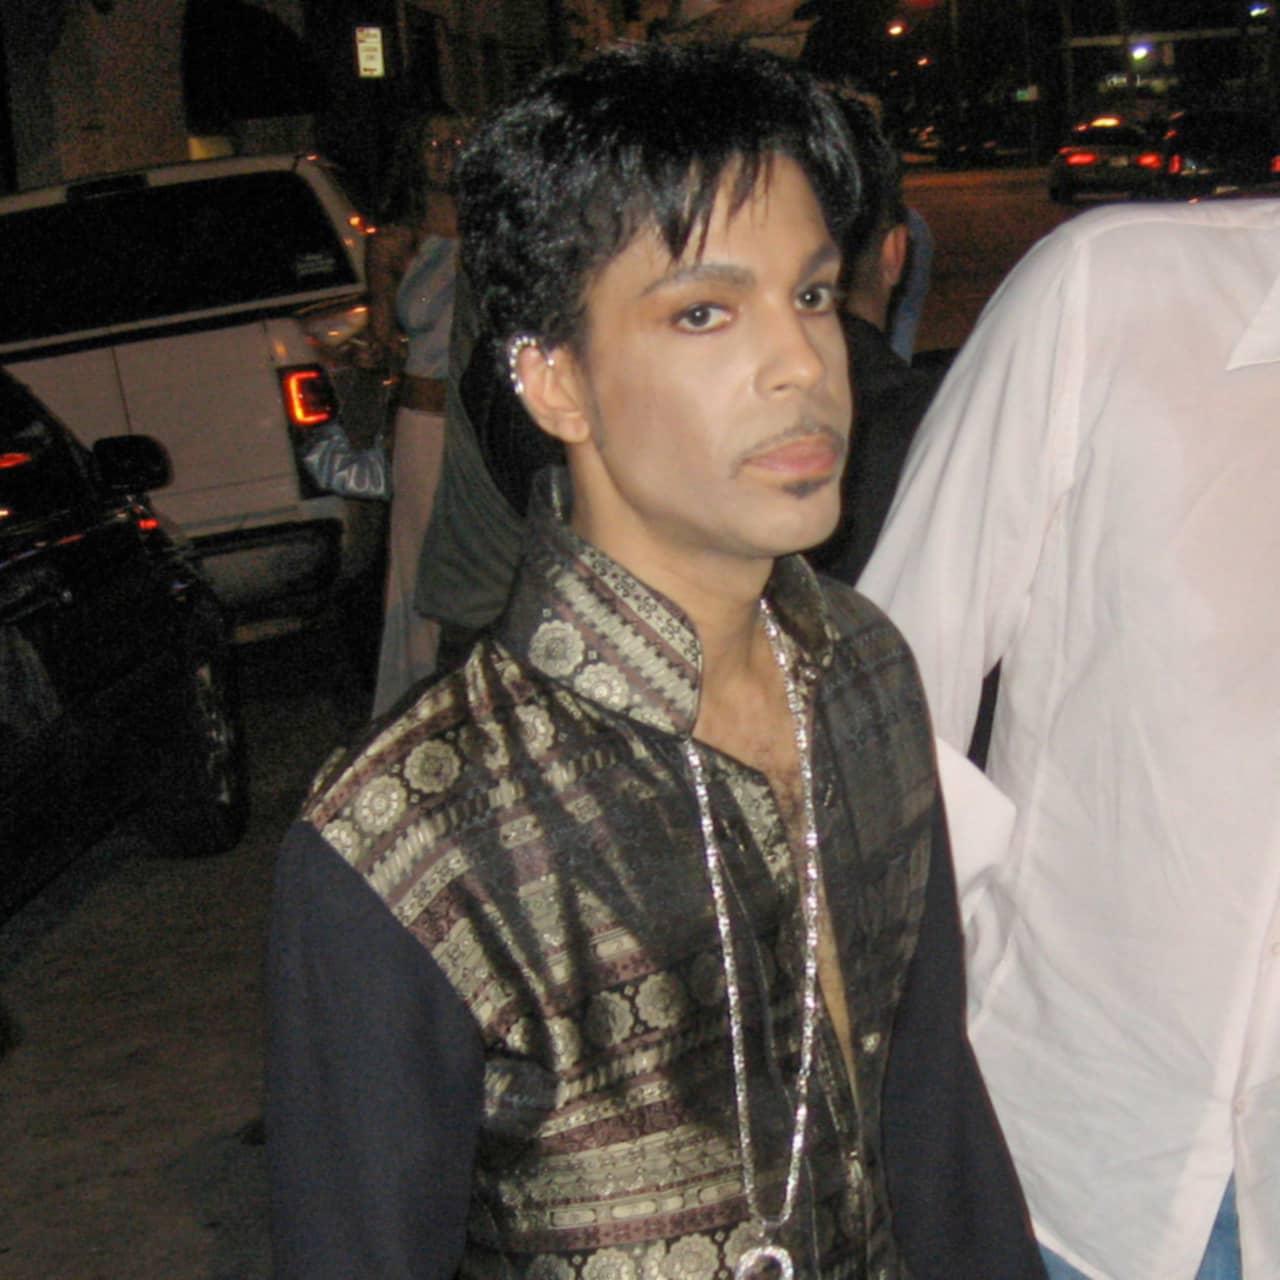 prince dödsorsak